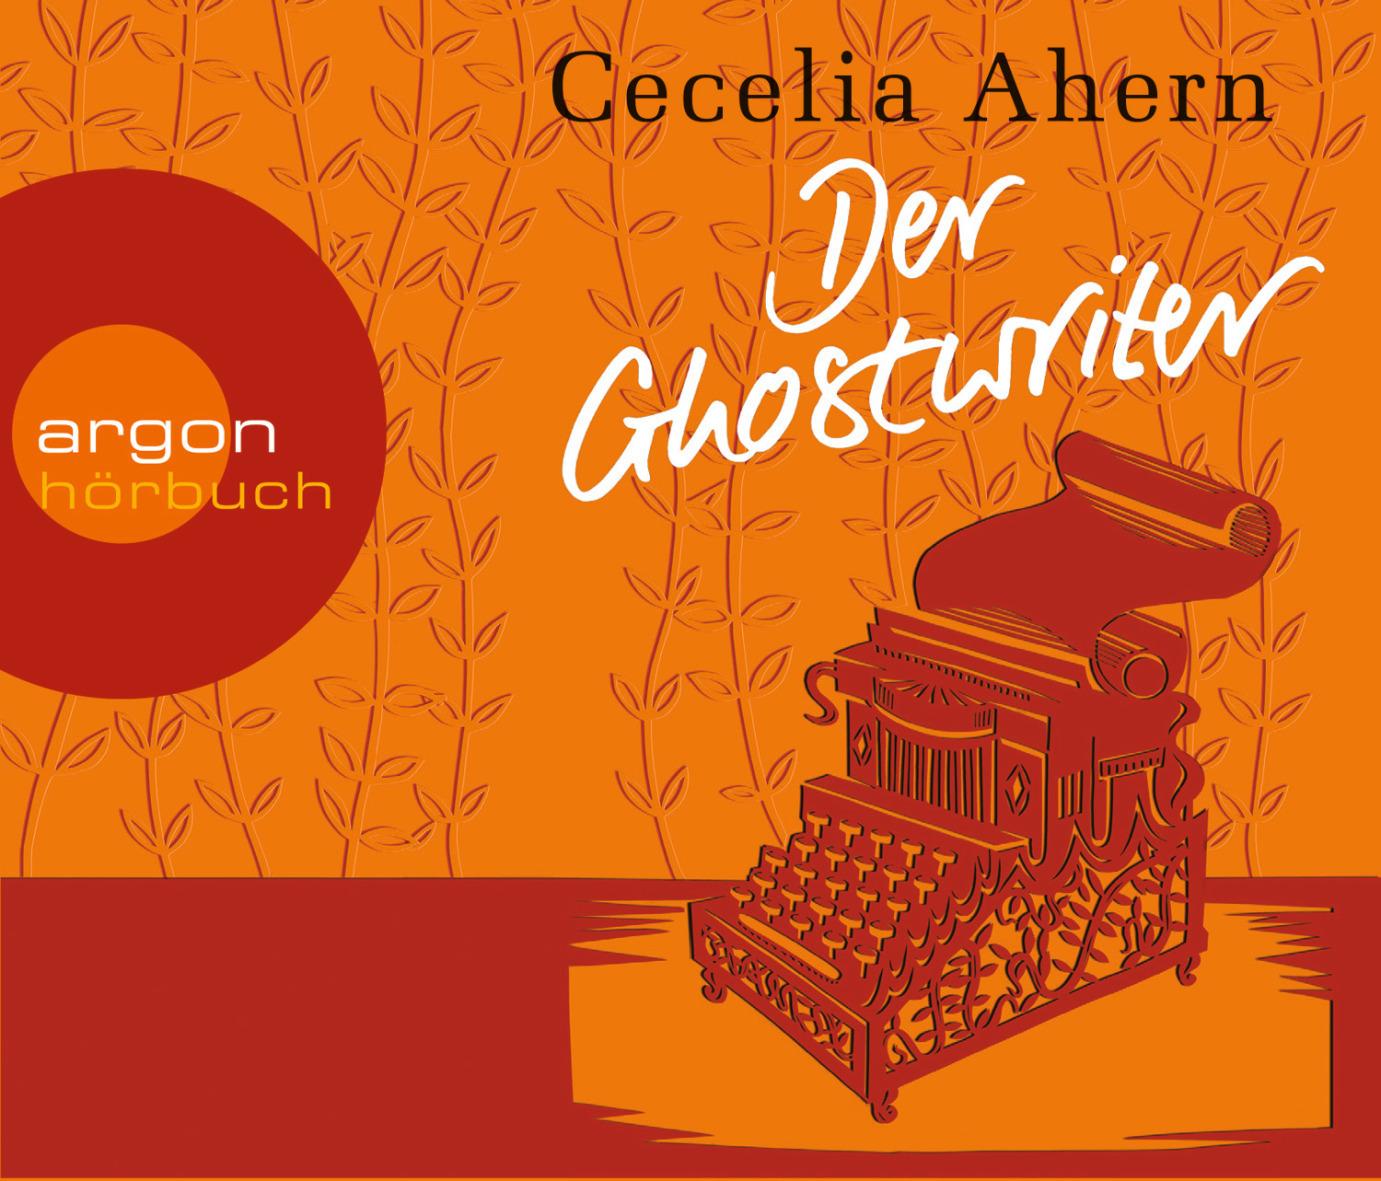 Der Ghostwriter: Novelle - Cecelia Ahern